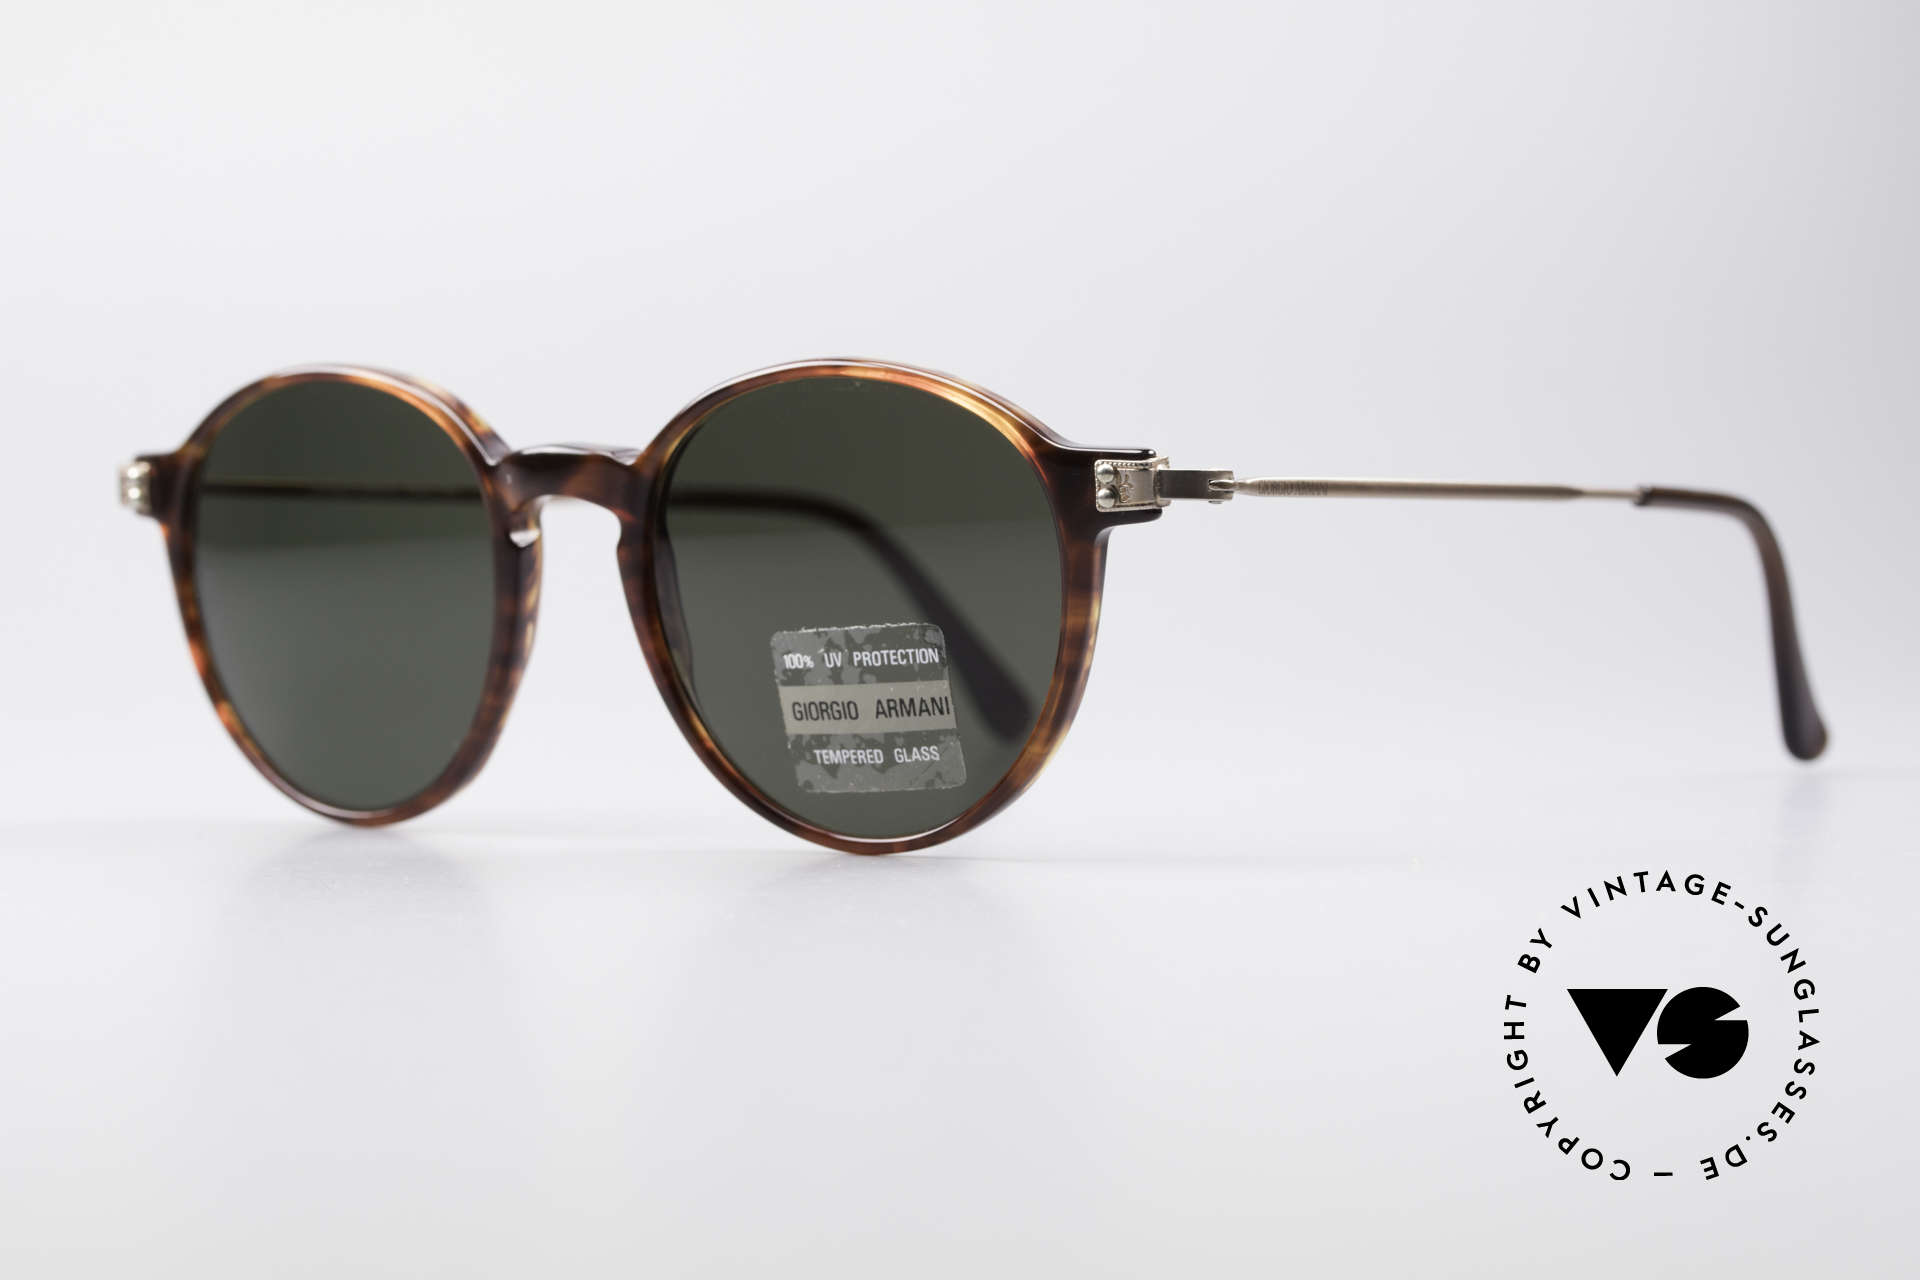 Giorgio Armani 358 Vintage Panto Sunglasses, coated & non reflecting mineral lenses (GA-engraving), Made for Men